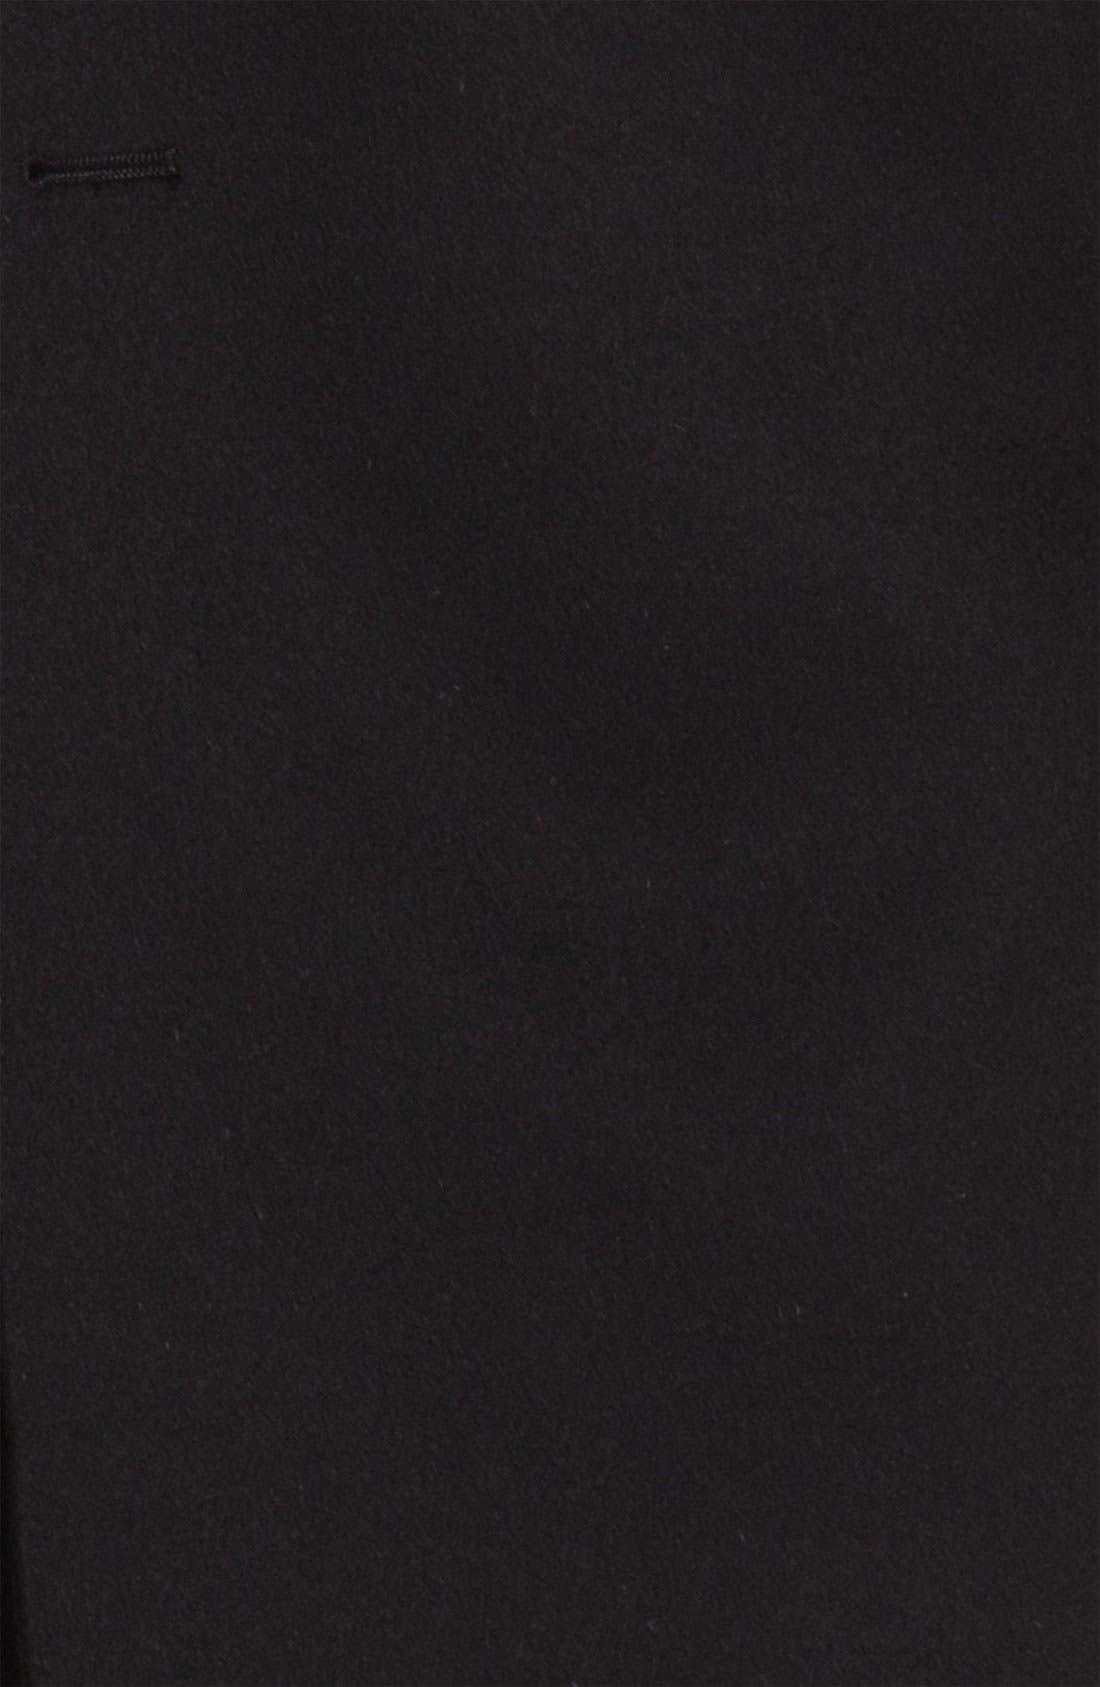 Alternate Image 3  - Cardinal of Canada Wool Blend Topcoat